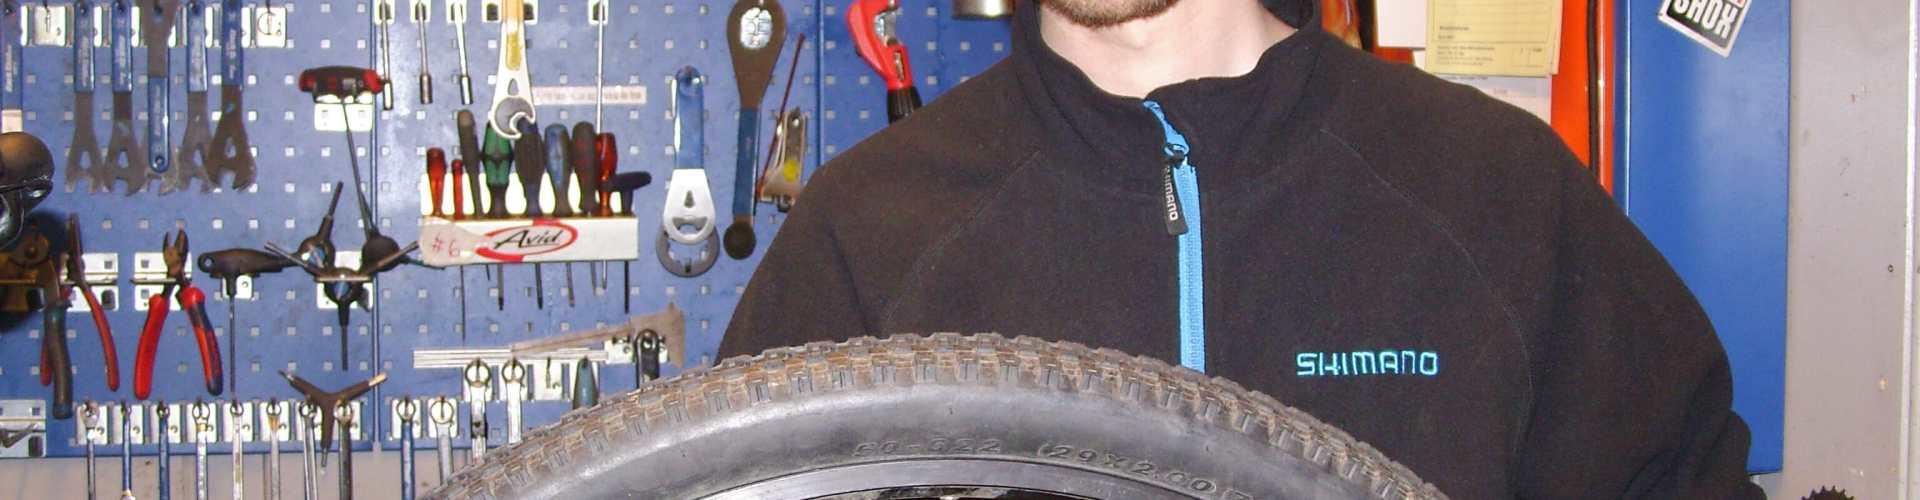 Mekketips: Slik fikser du en punktering